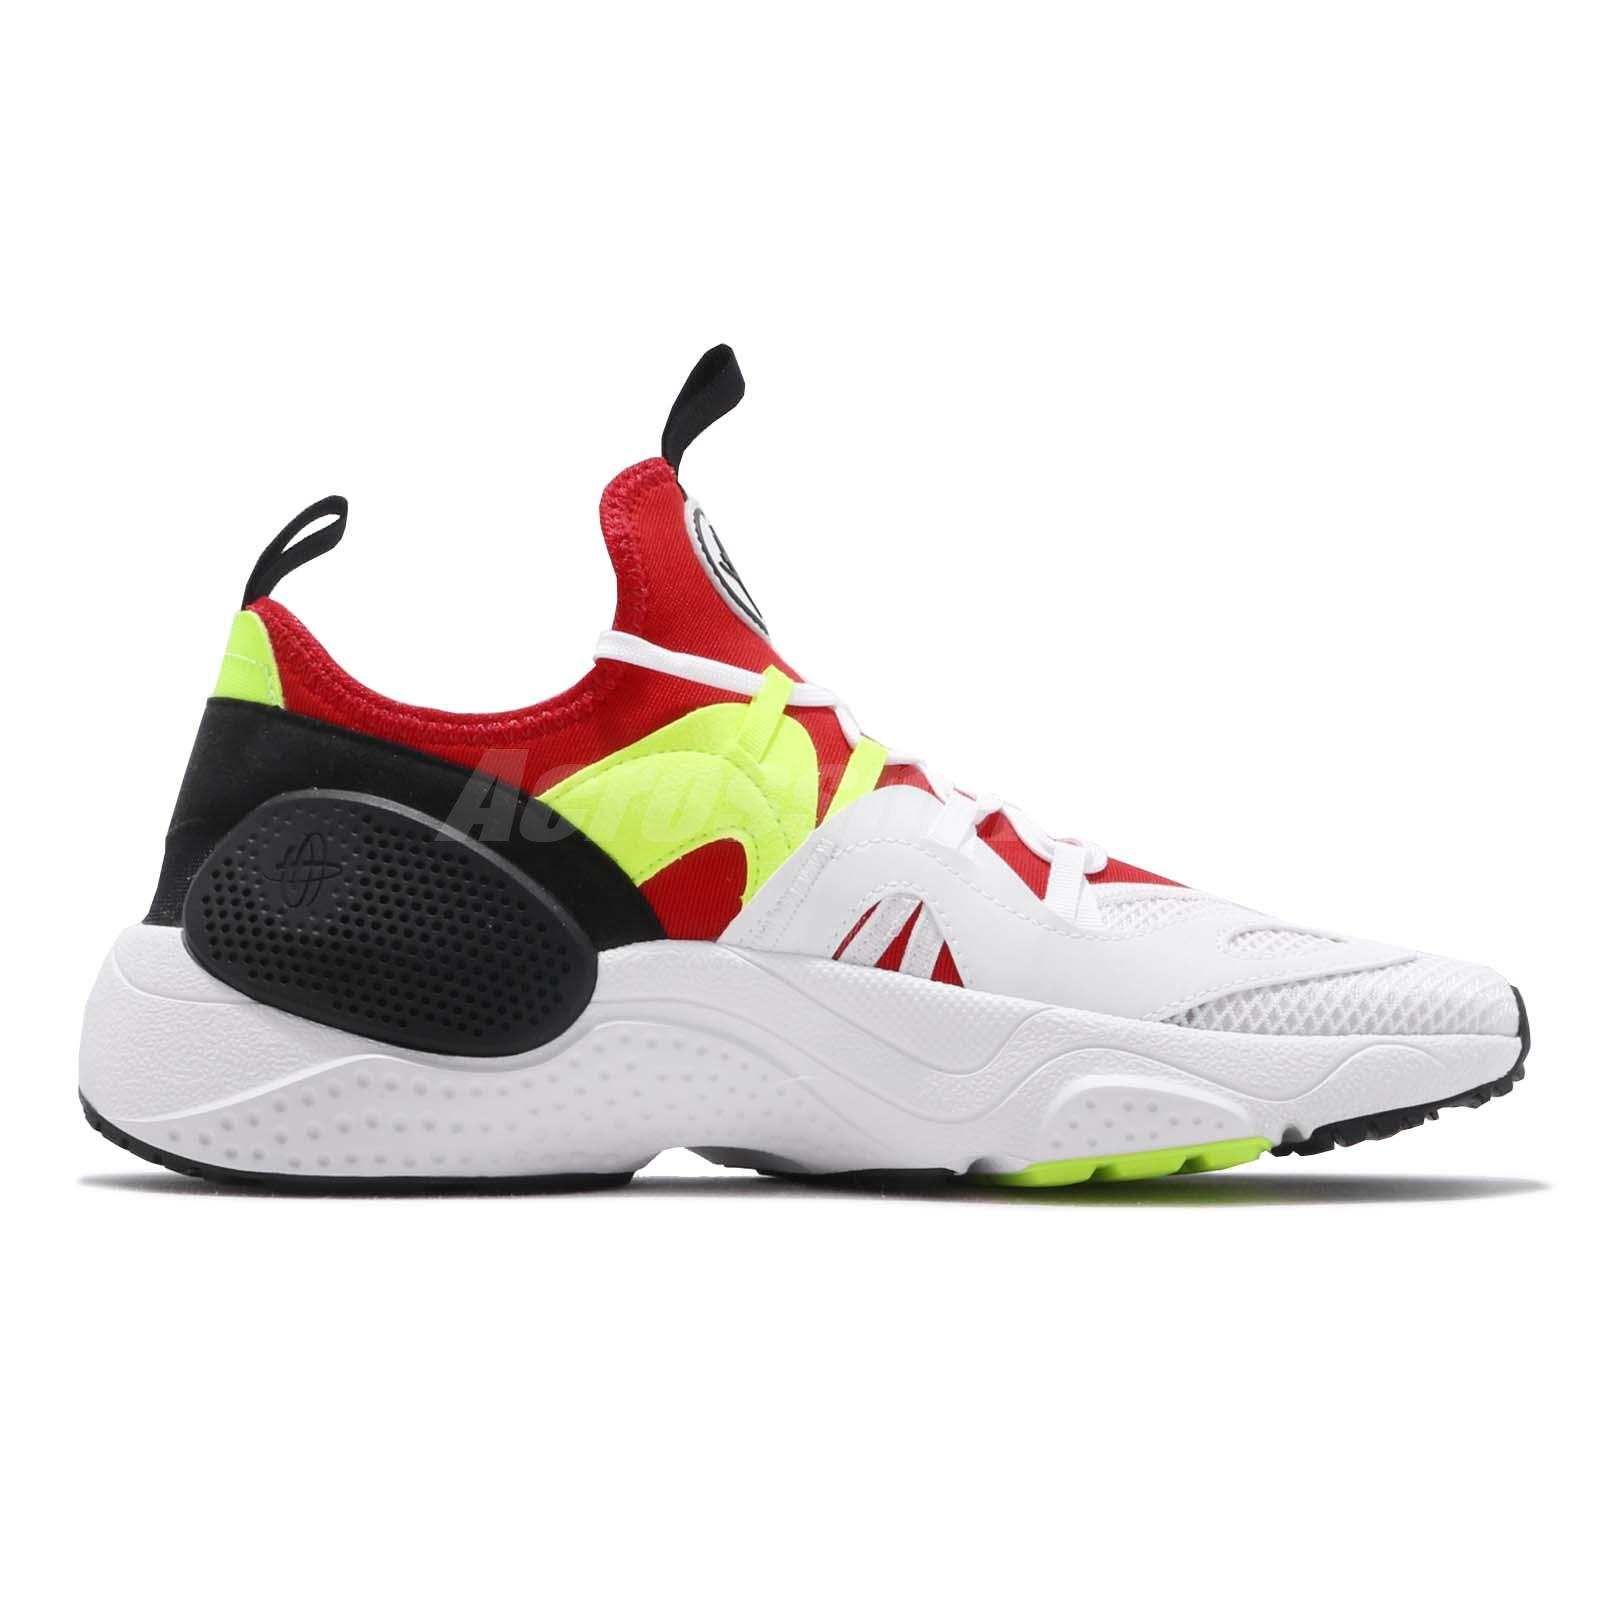 a7c2593d8113 Nike Huarache E.D.G.E. Txt White Red Volt Black Men Shoes Sneakers ...